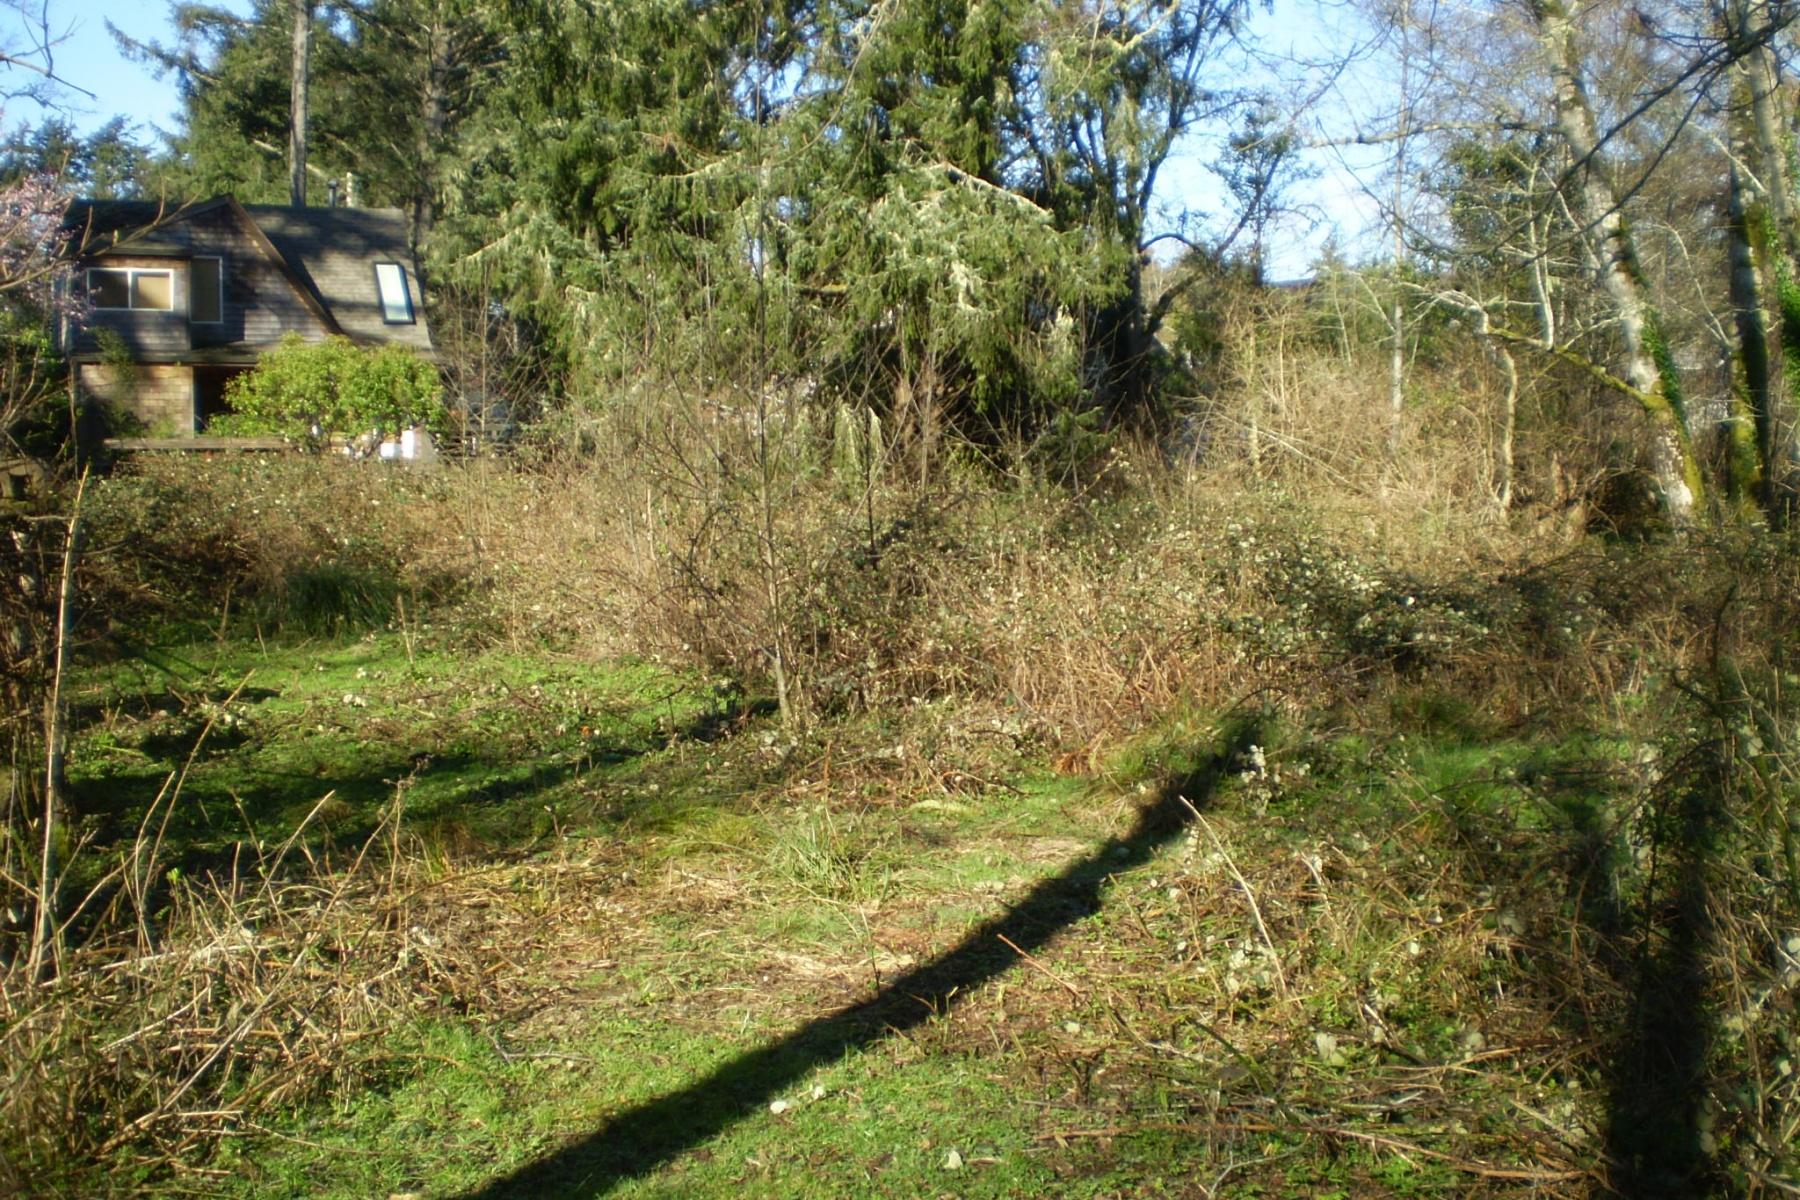 Đất đai vì Bán tại Ecola Park RD, CANNON BEACH Cannon Beach, Oregon, 97110 Hoa Kỳ